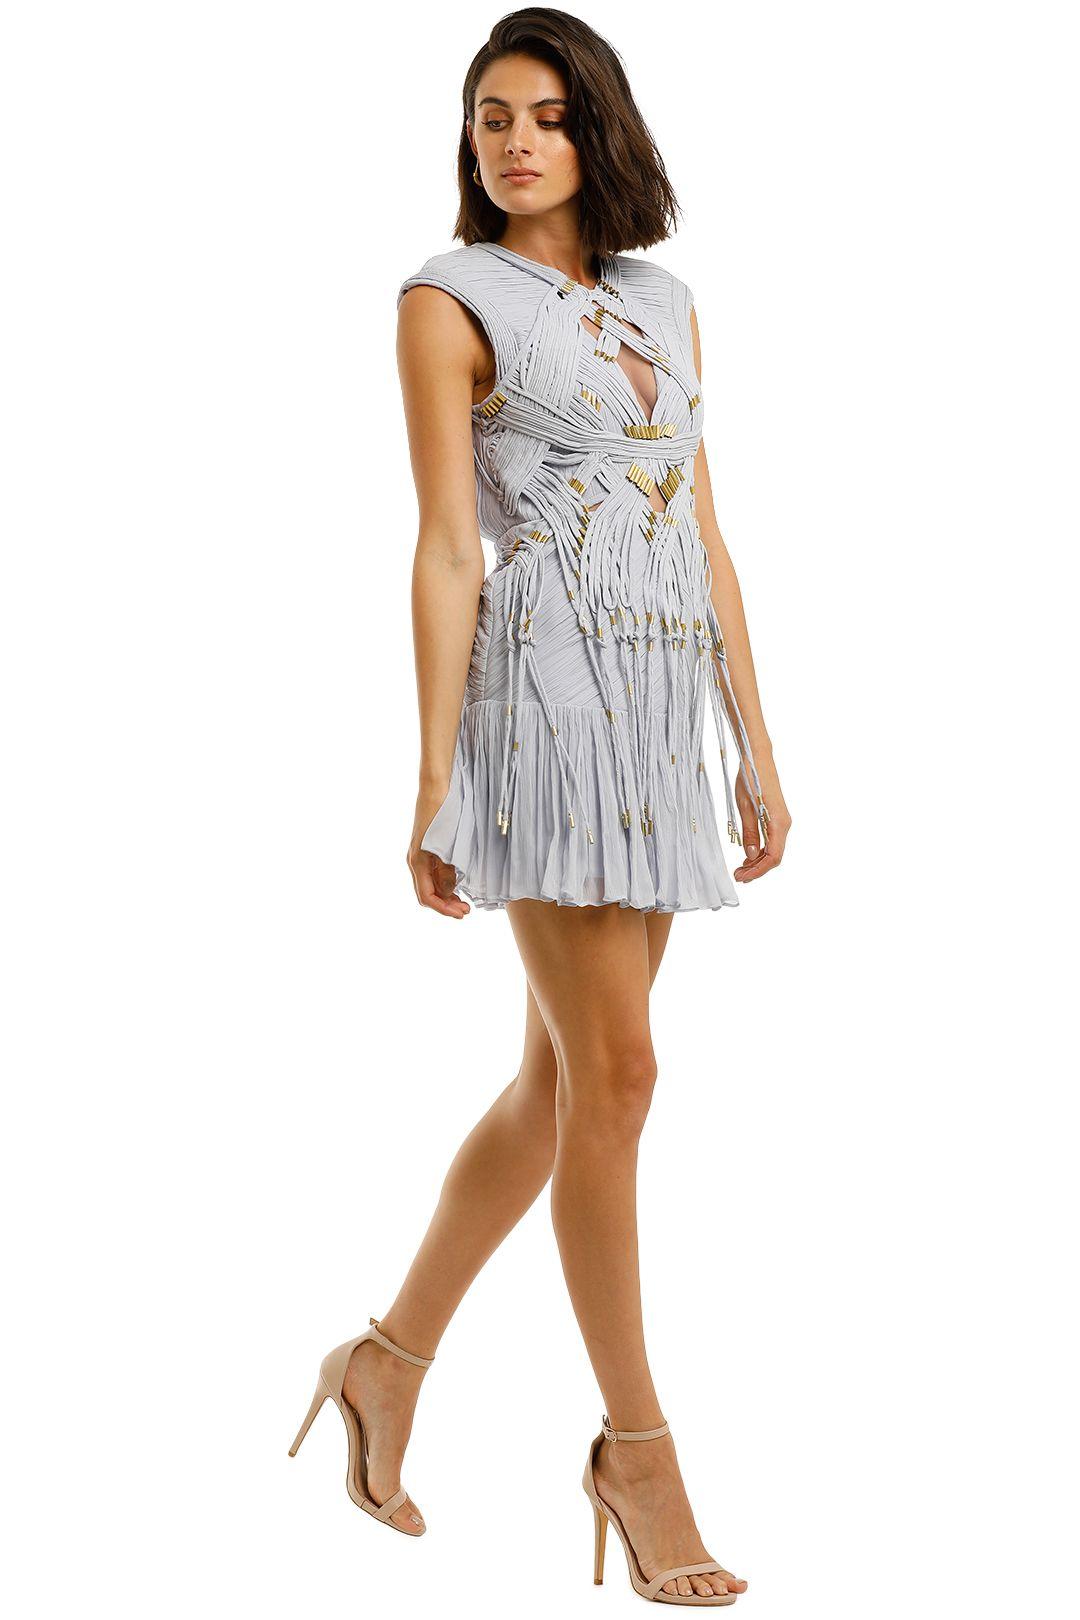 Thurley-Atlantis-Dress-Xenon-Blue-Side